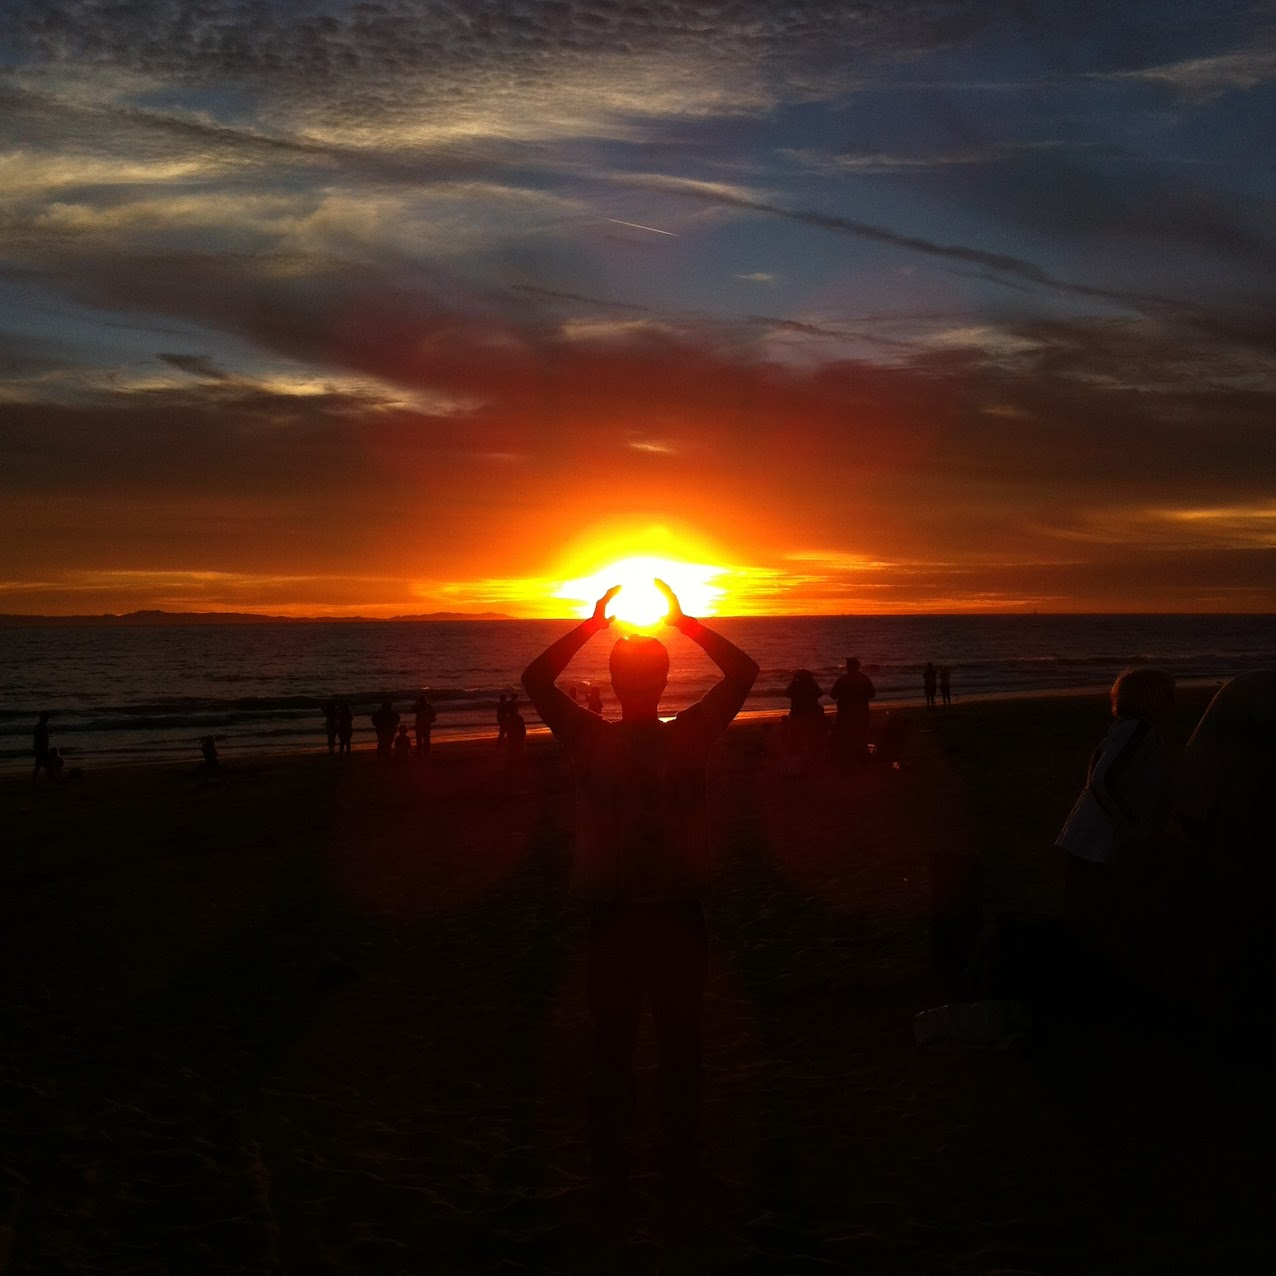 Edmund with sunset